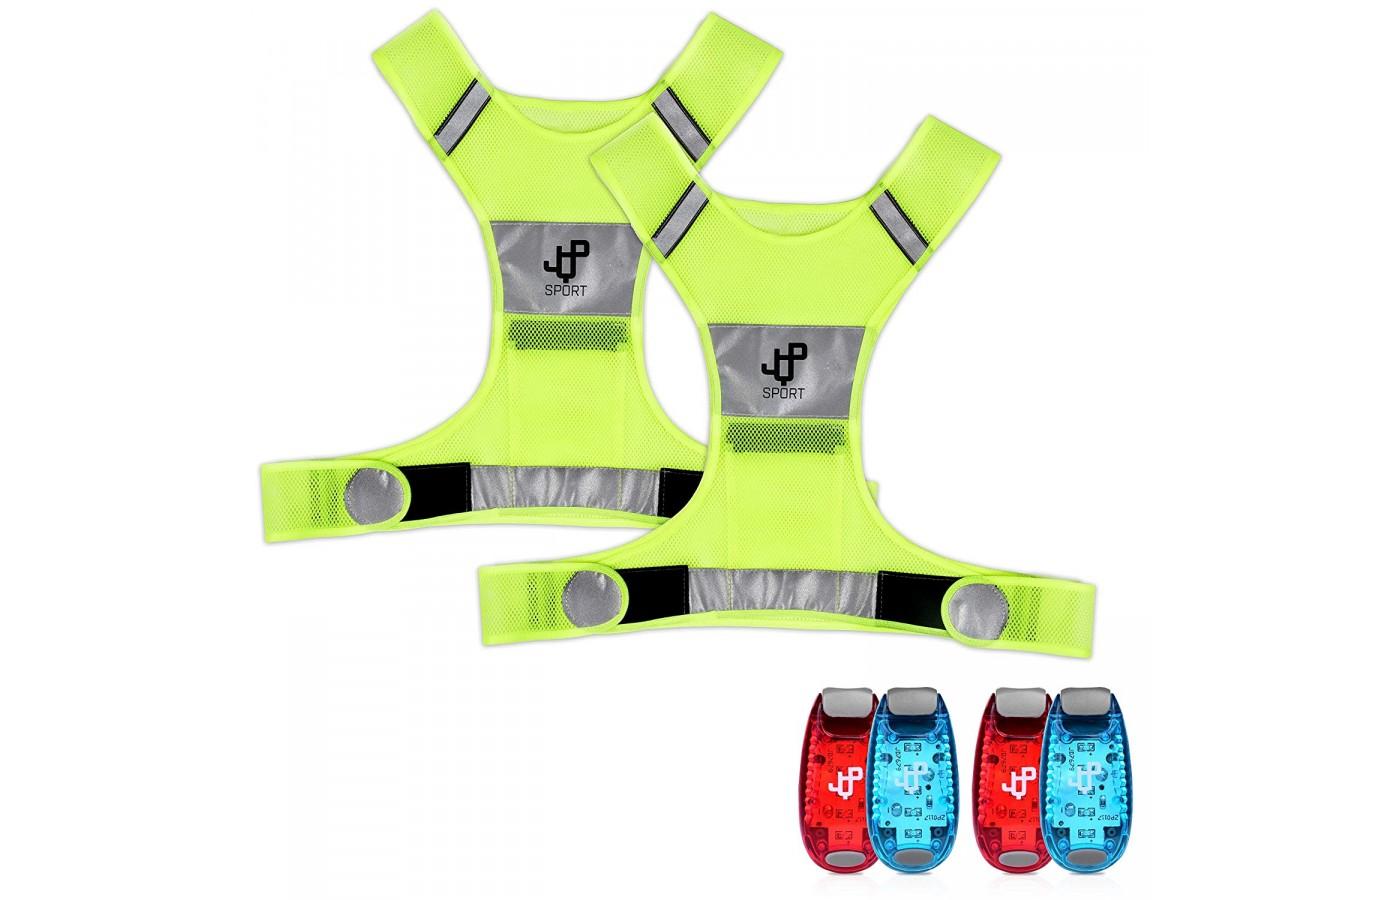 JQP Sports Running Vest feature